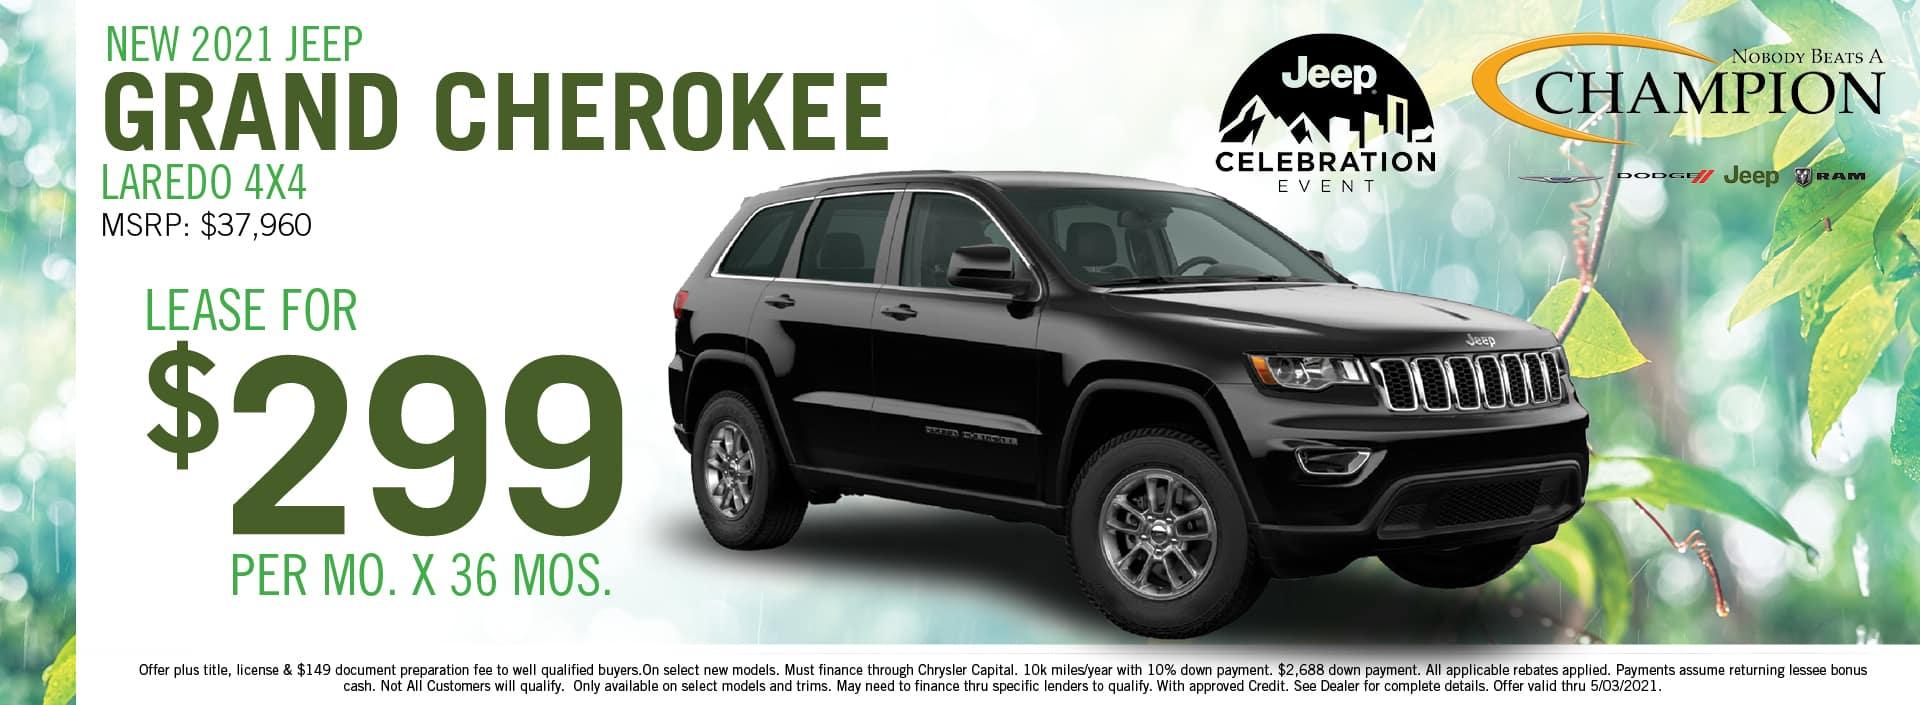 2021 Jeep Grand Cherokee Lease Deals - Champion CDJR